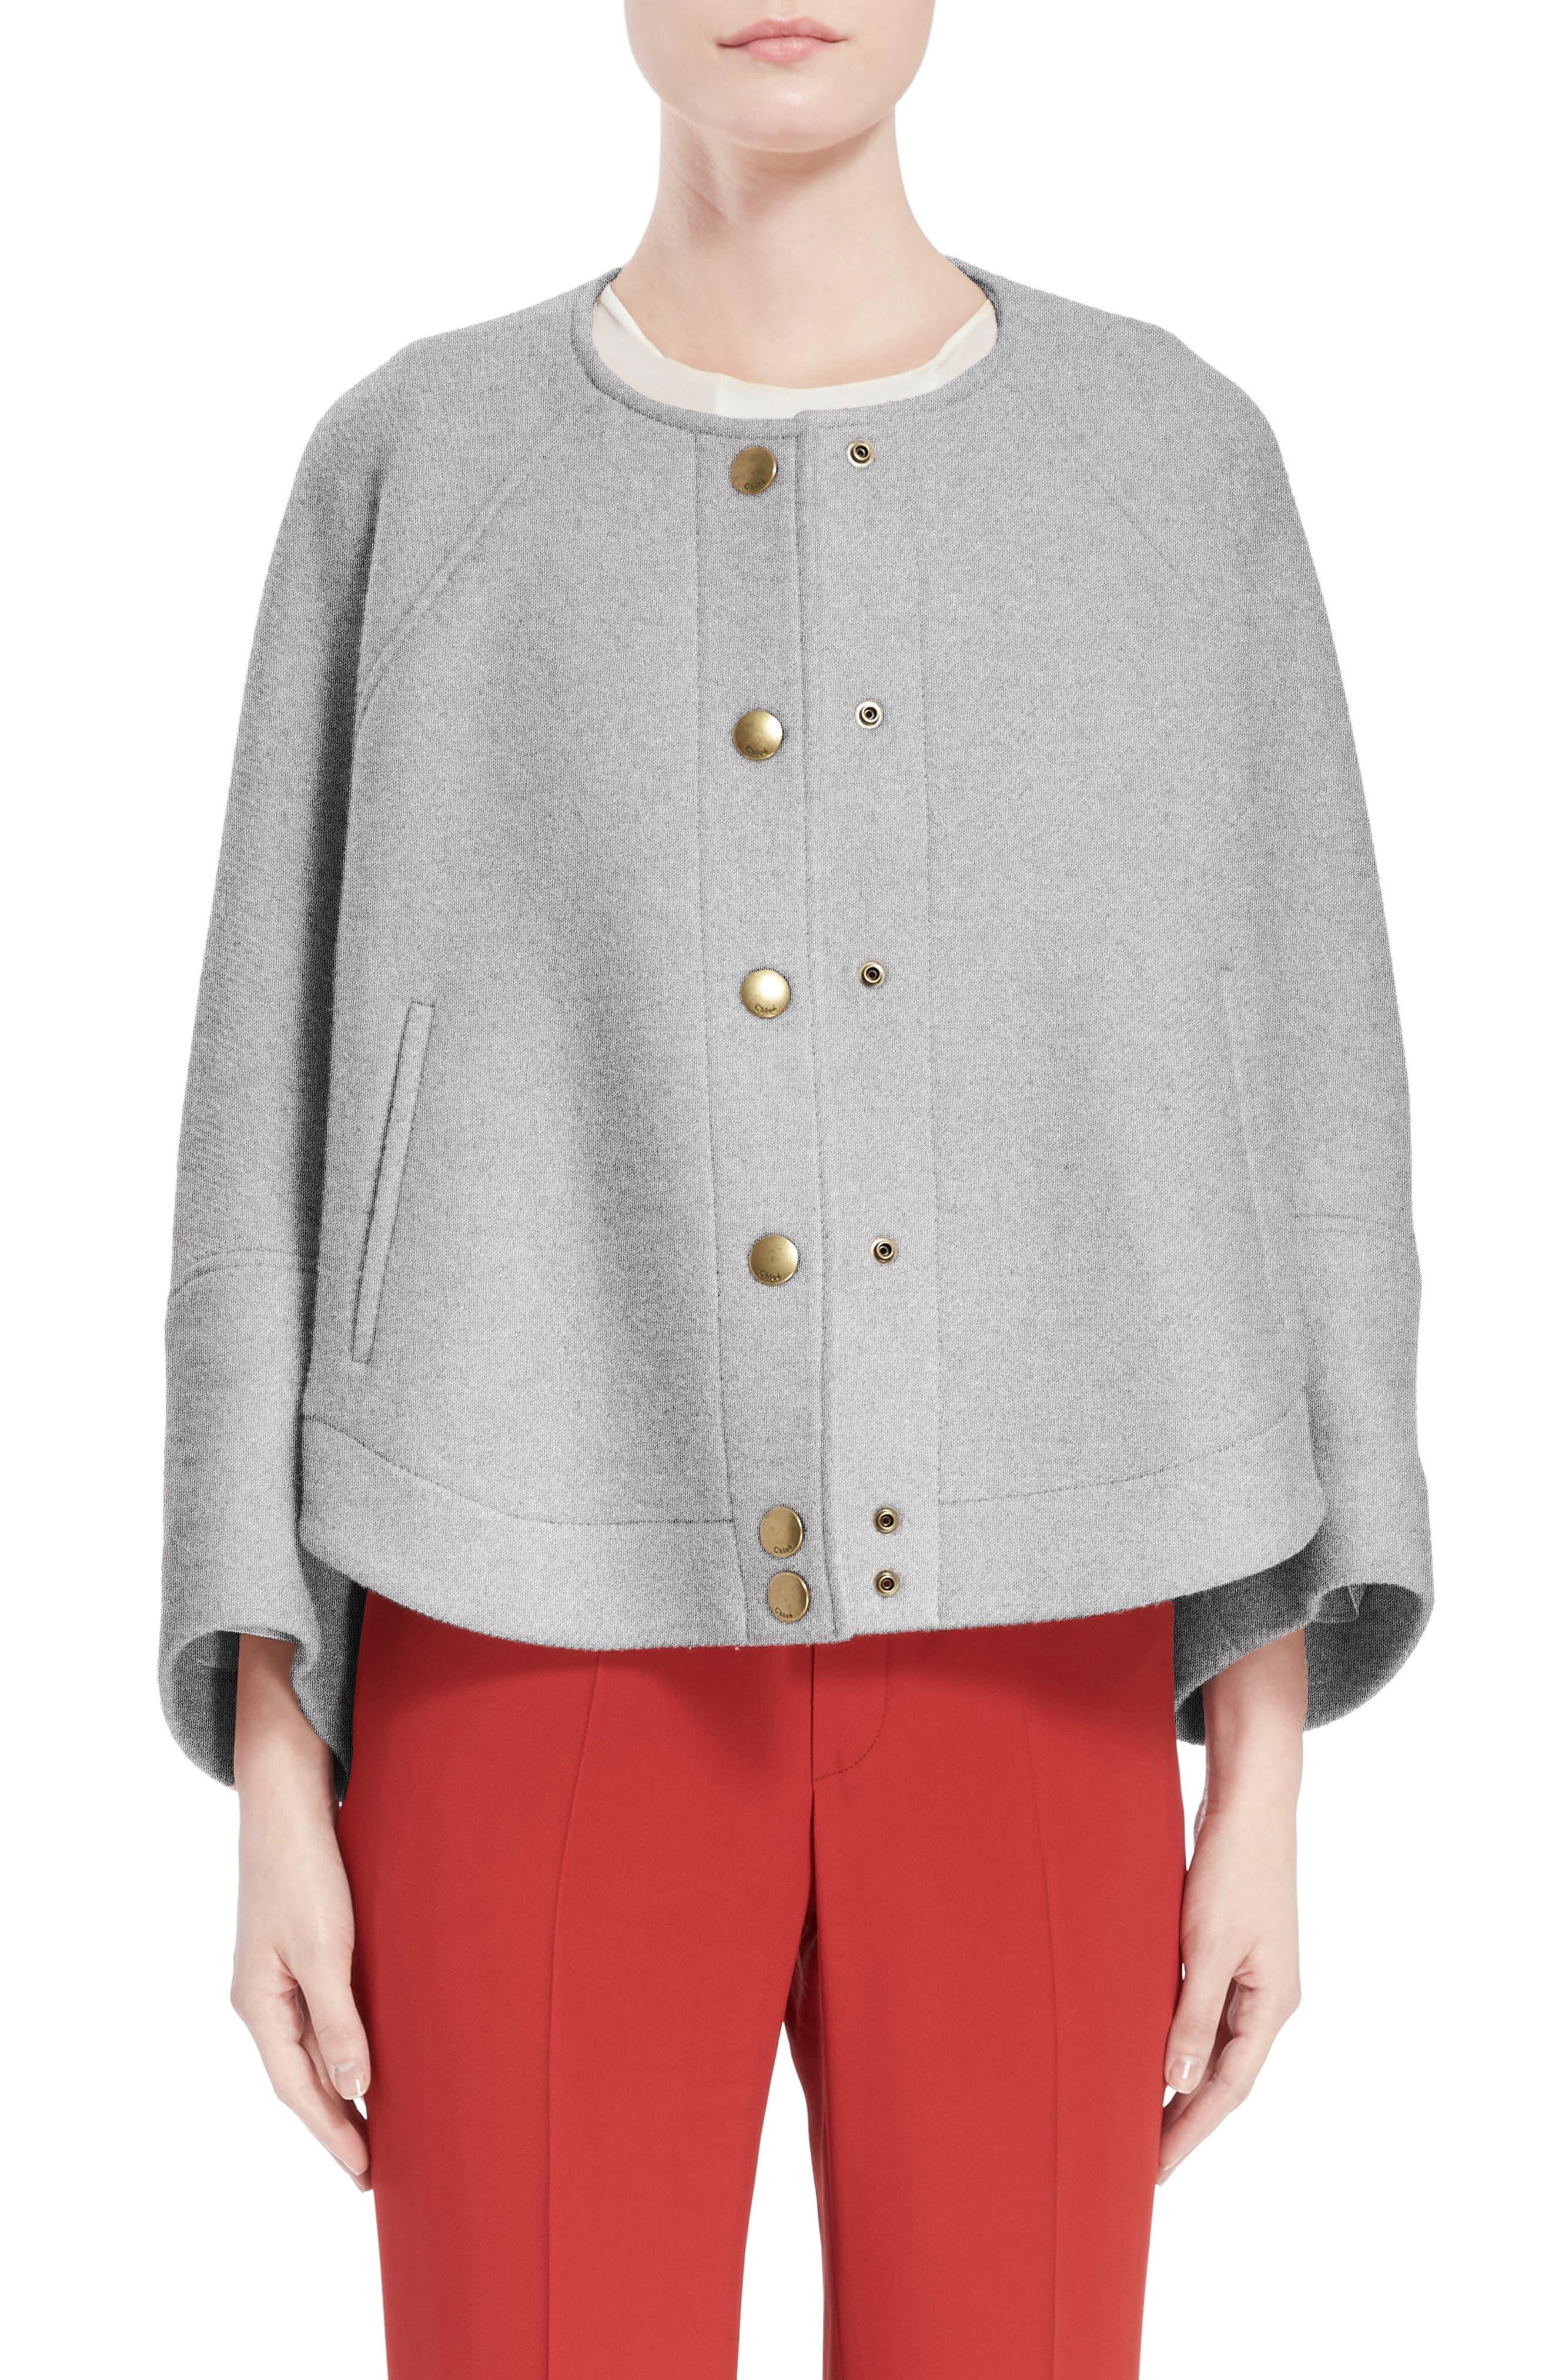 Main Image - Chloé Wool Blend Baseball Jacket